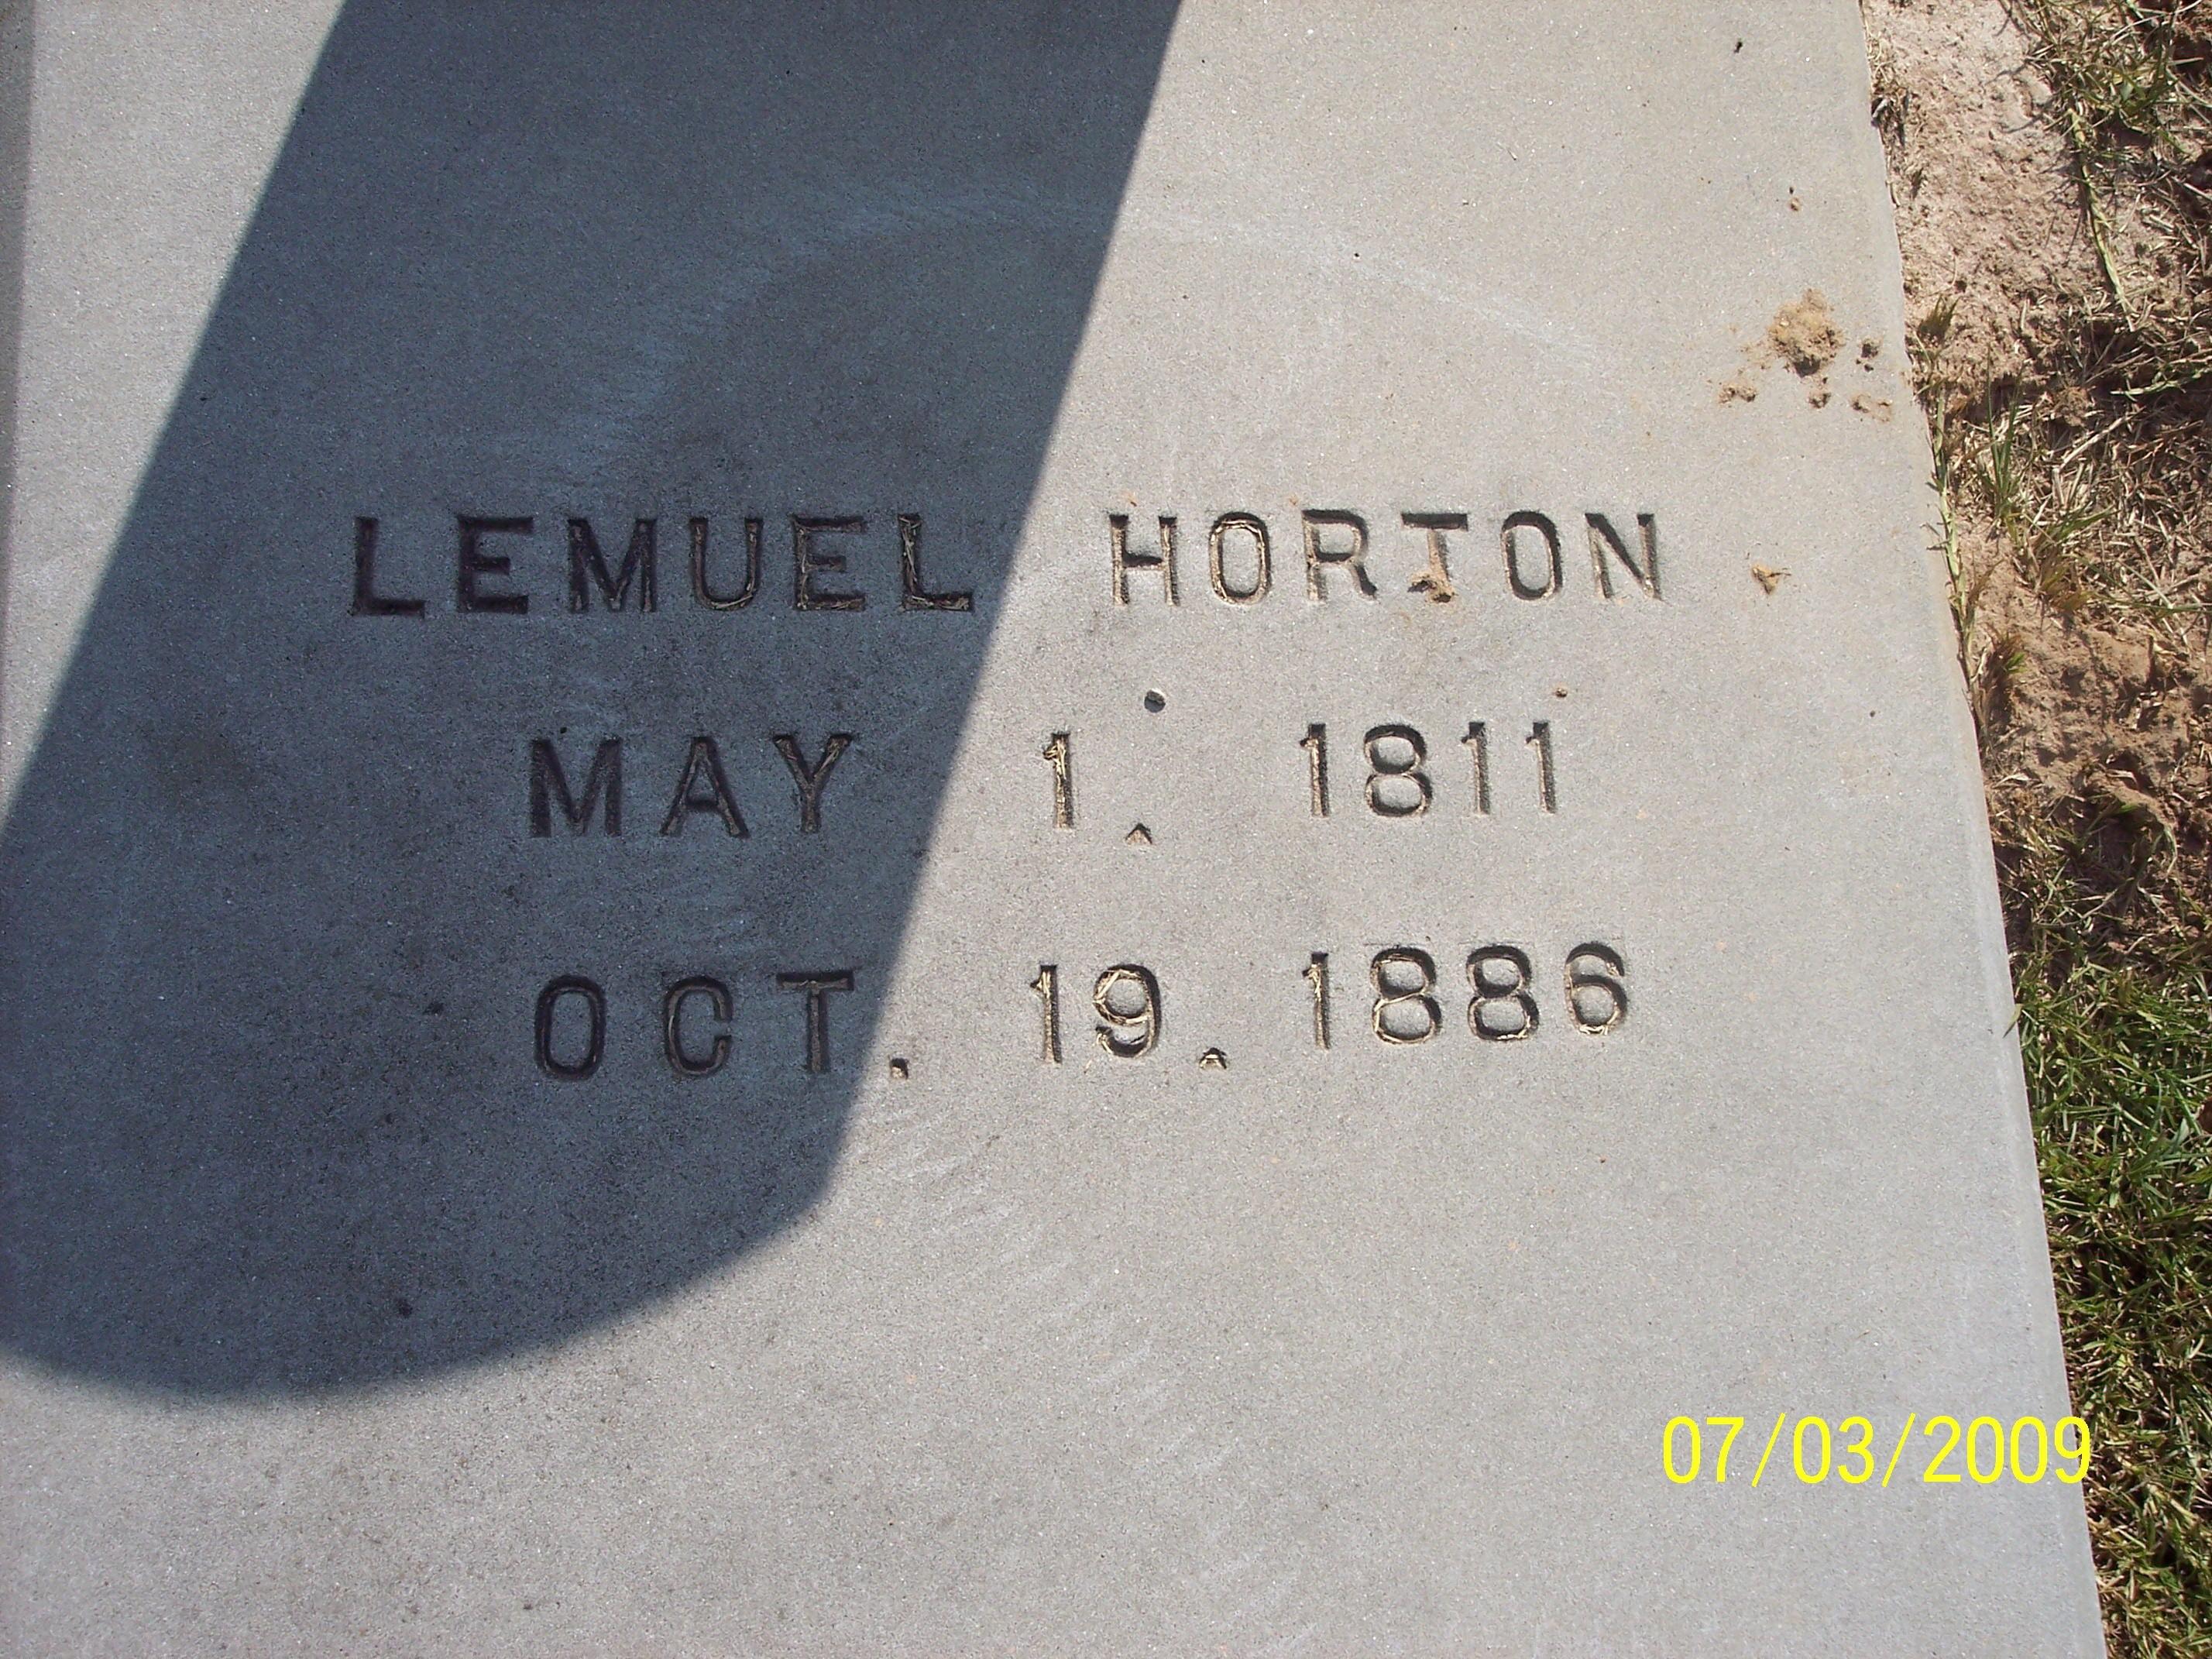 Lemuel Horton